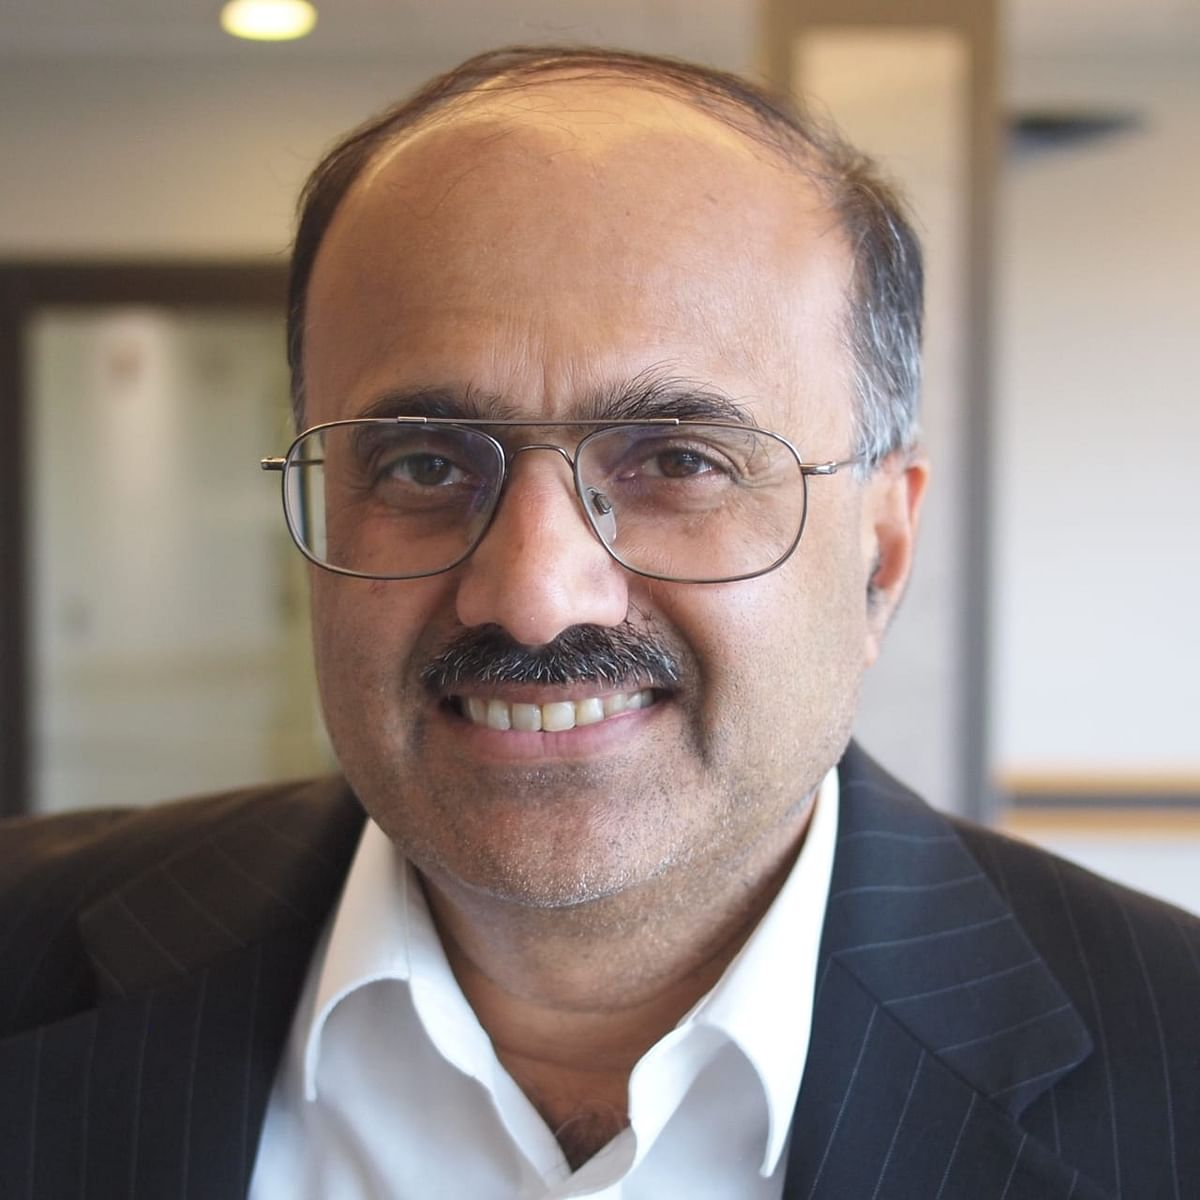 The future will see Pervacio challenge market convention and embrace change: Sanjay Kanodia, CEO of Pervacio